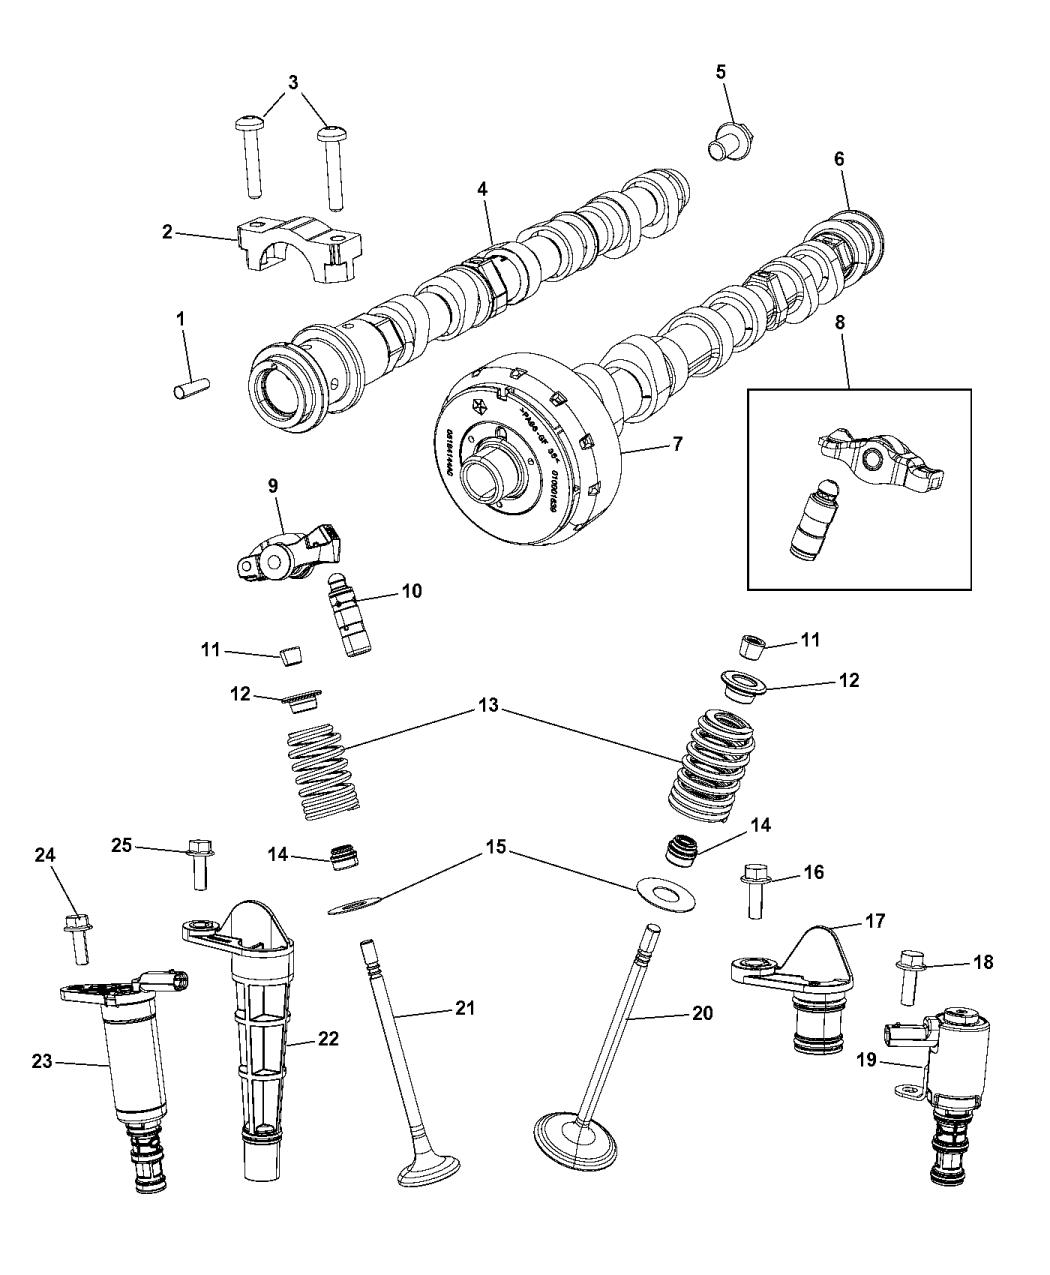 Genuine Chrysler PLUG-SOLENOID